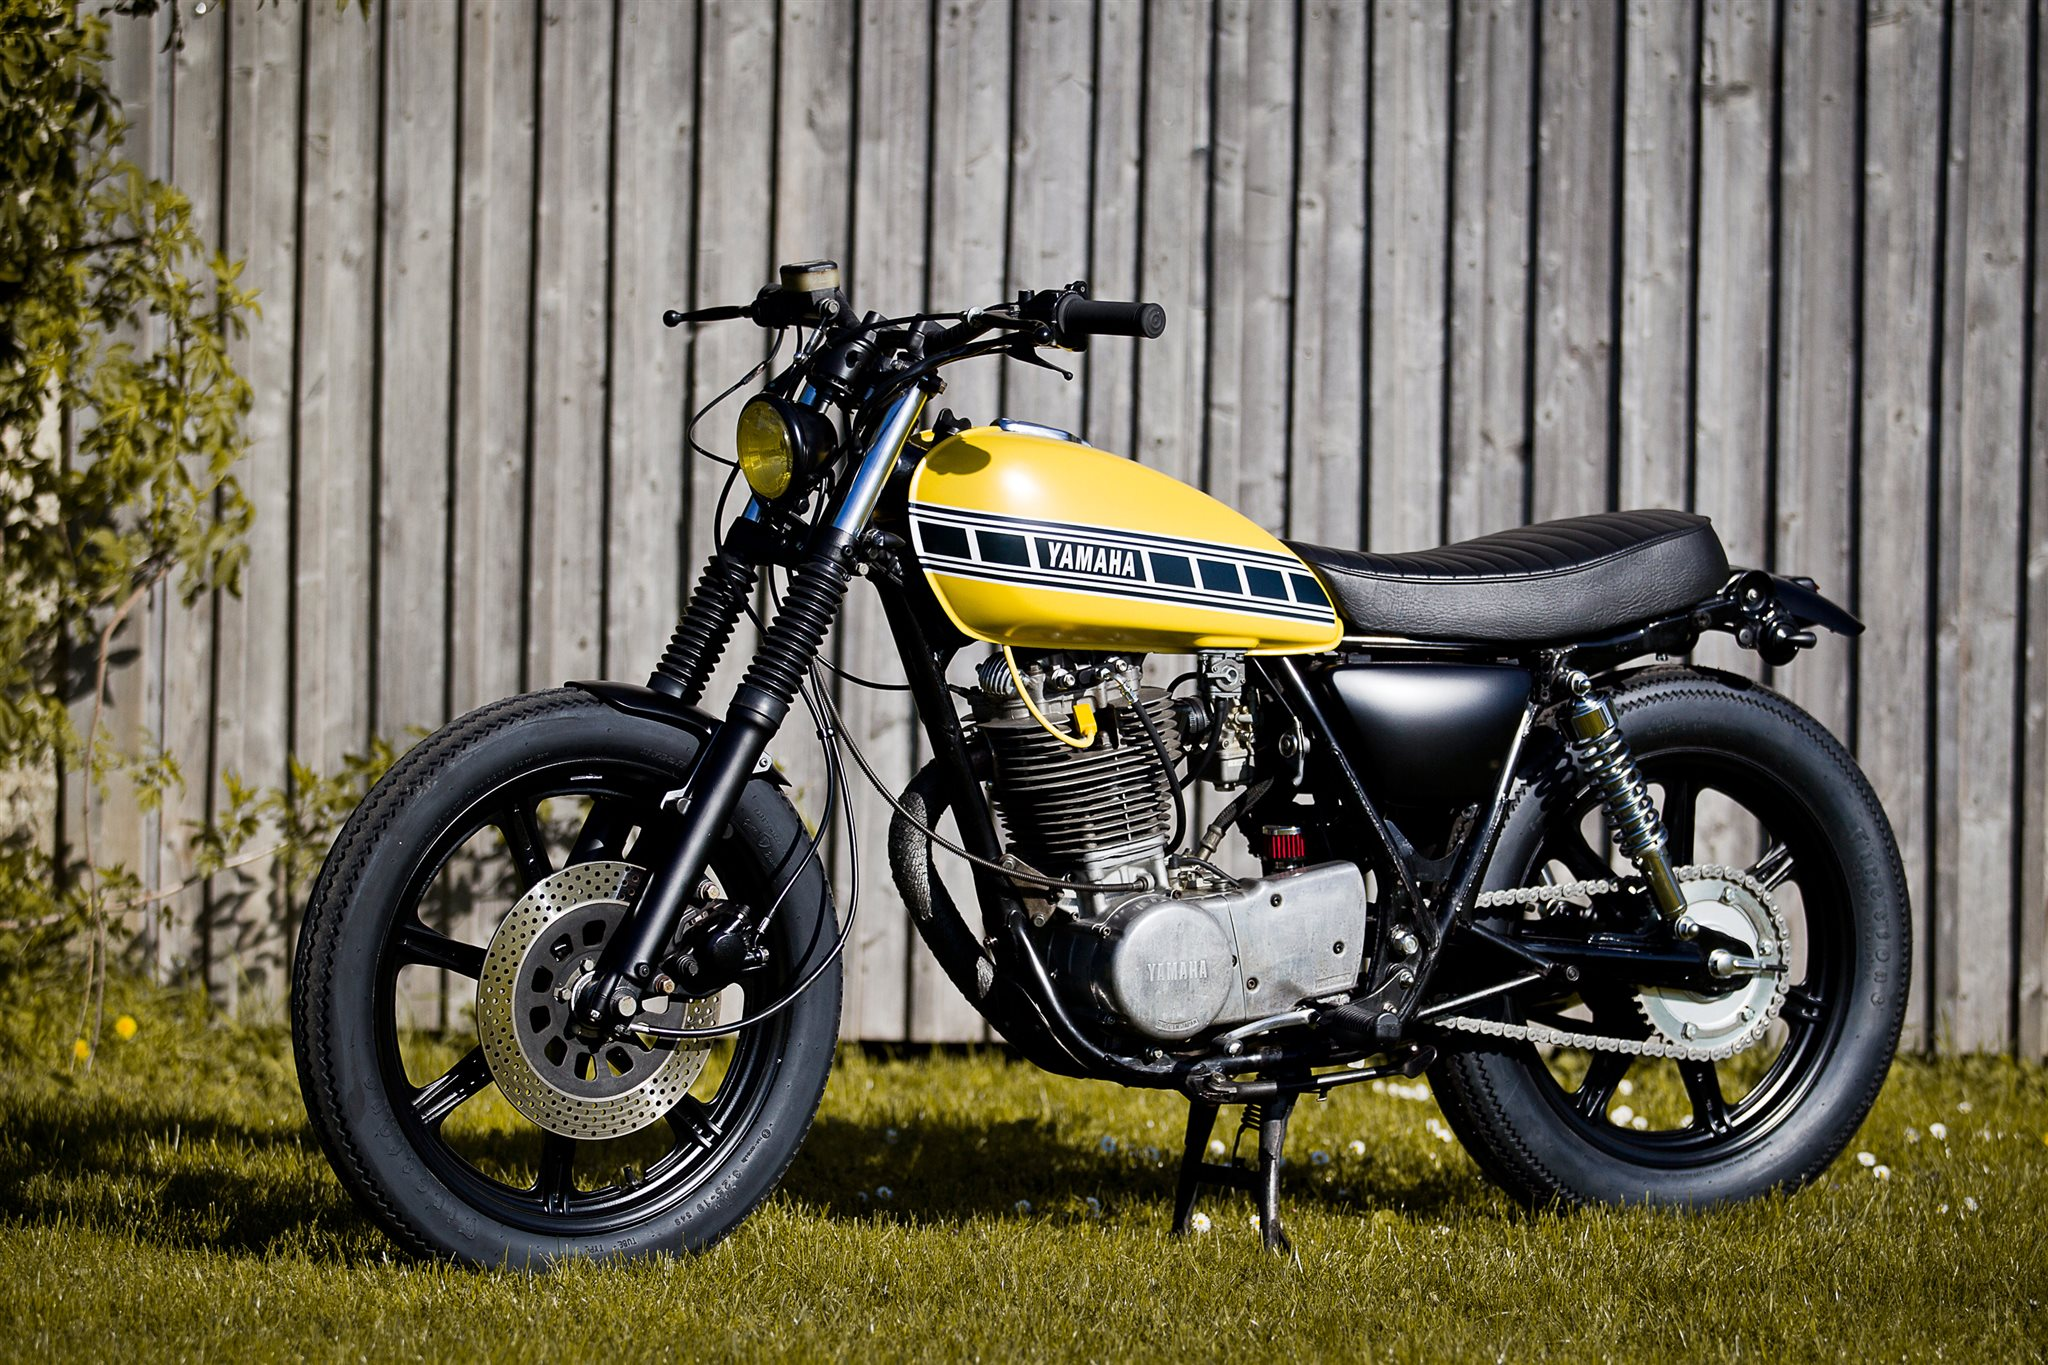 umgebautes motorrad yamaha sr 500 von ws motorradtechnik. Black Bedroom Furniture Sets. Home Design Ideas